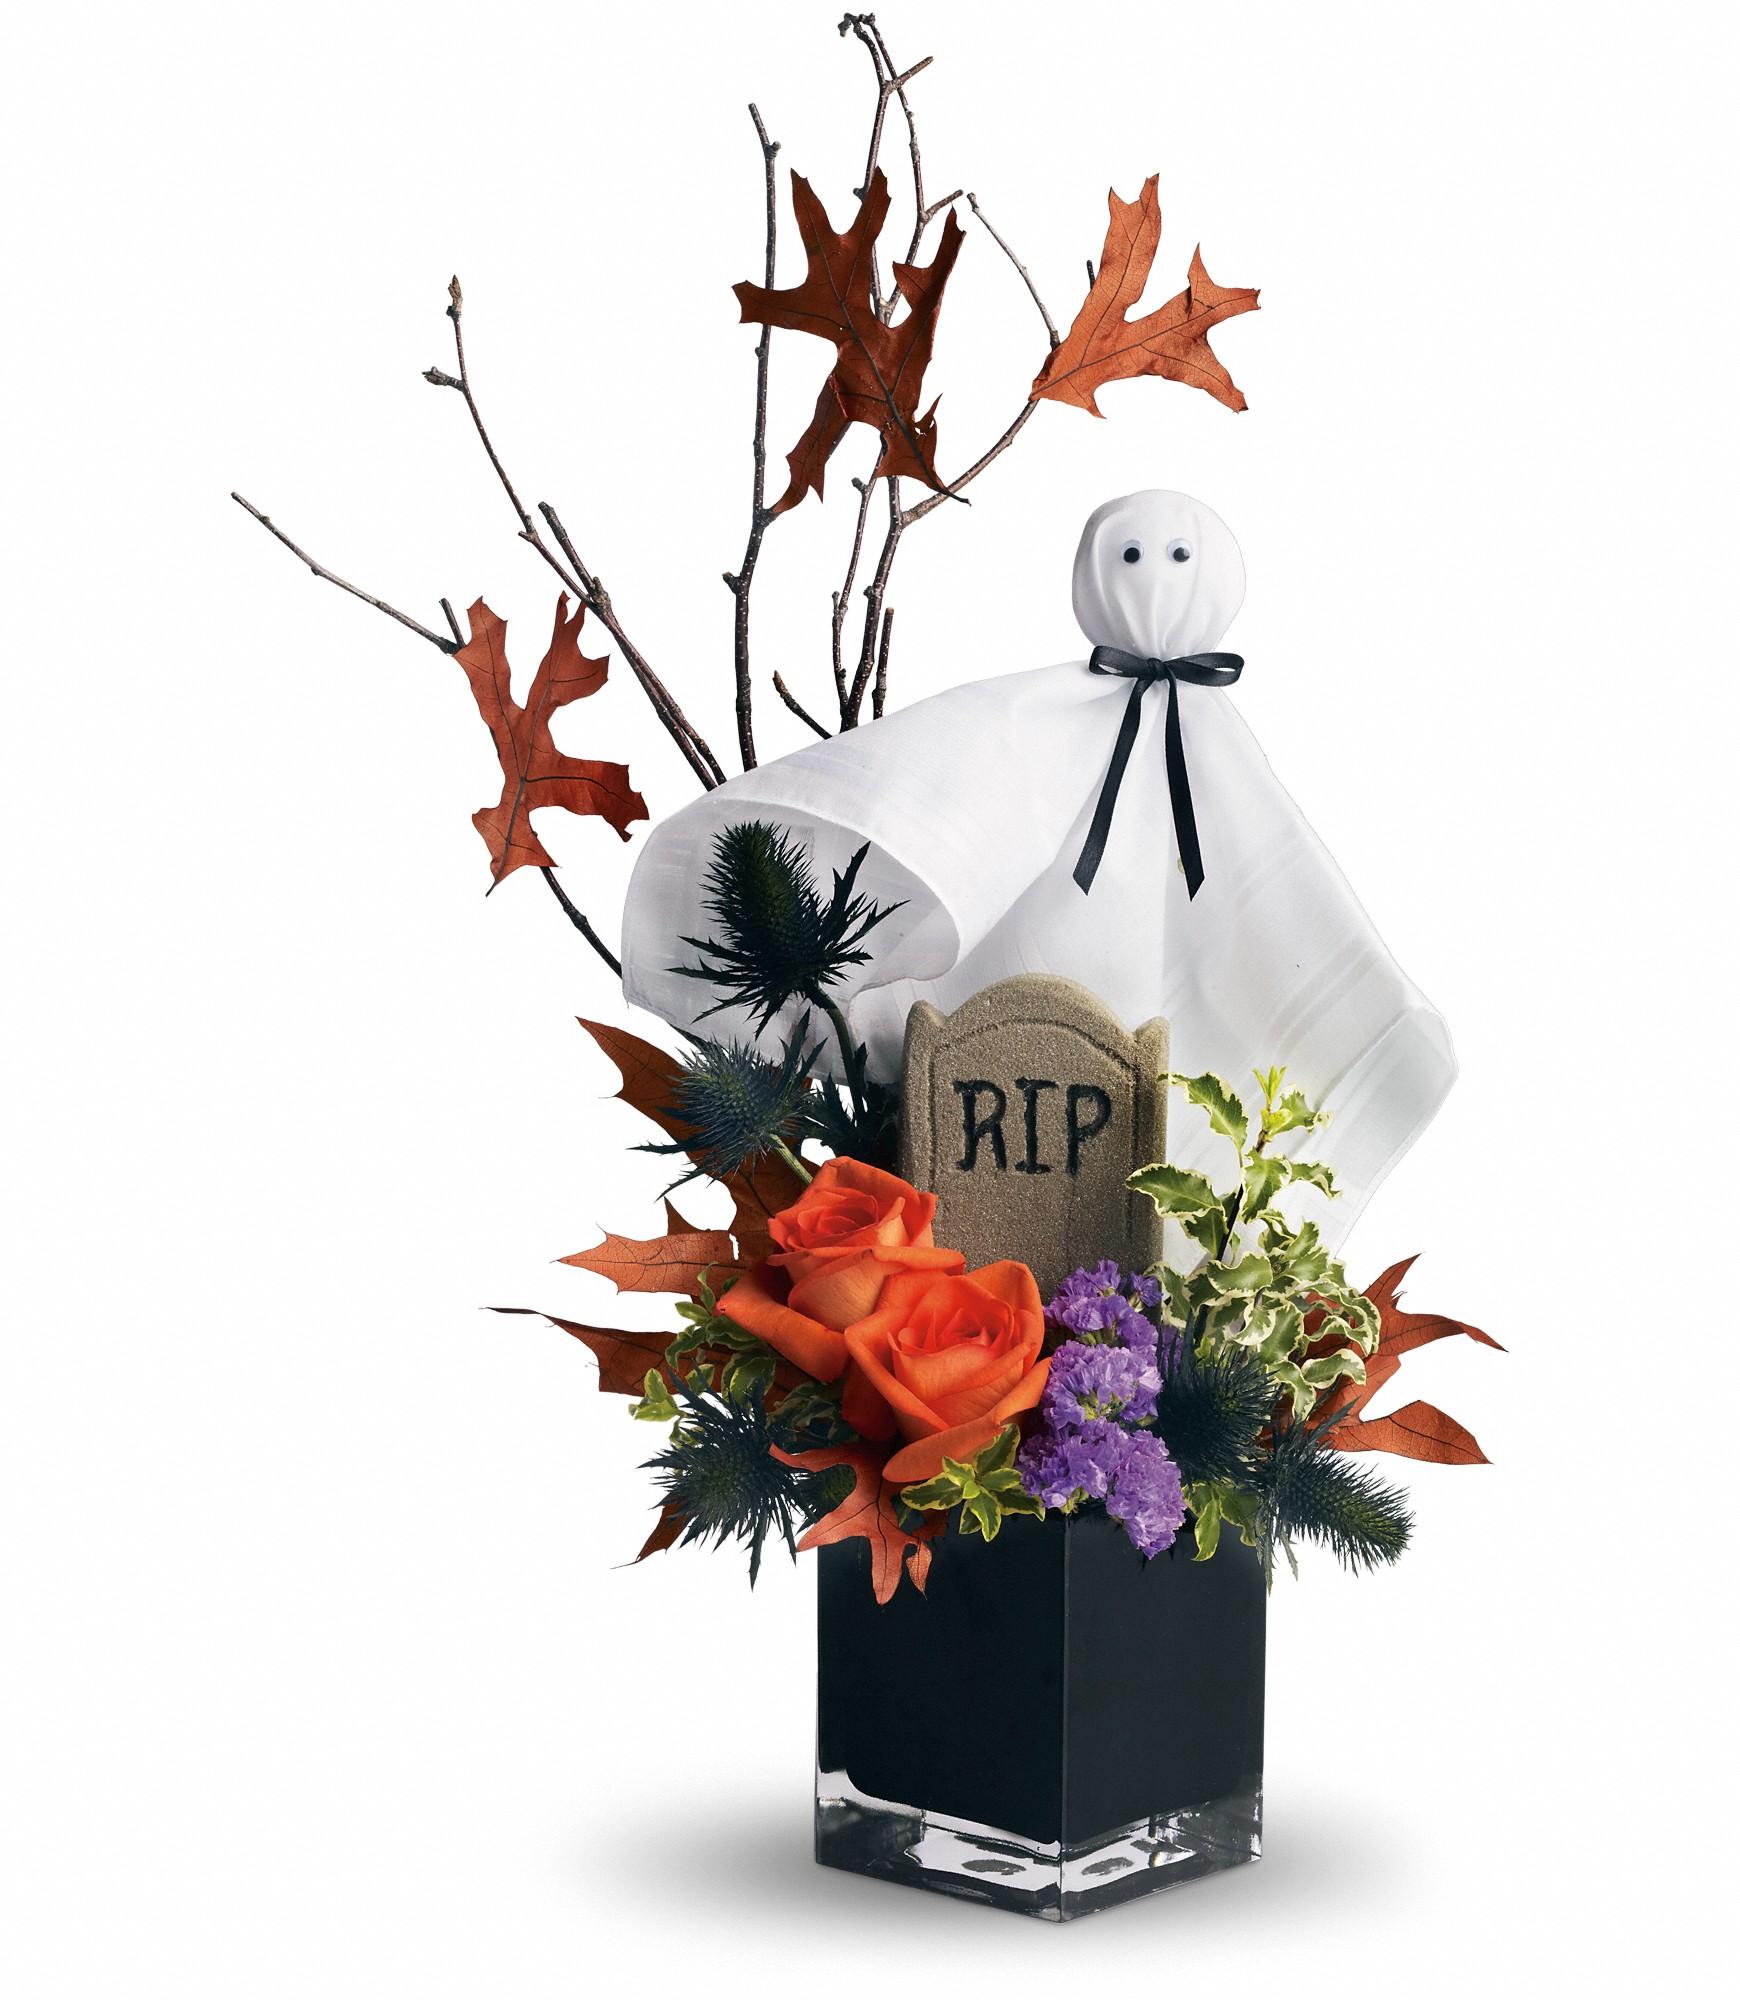 Halloween flowers houston florist 2gt1476580784 halloween flowers houston florist texas fall izmirmasajfo Choice Image